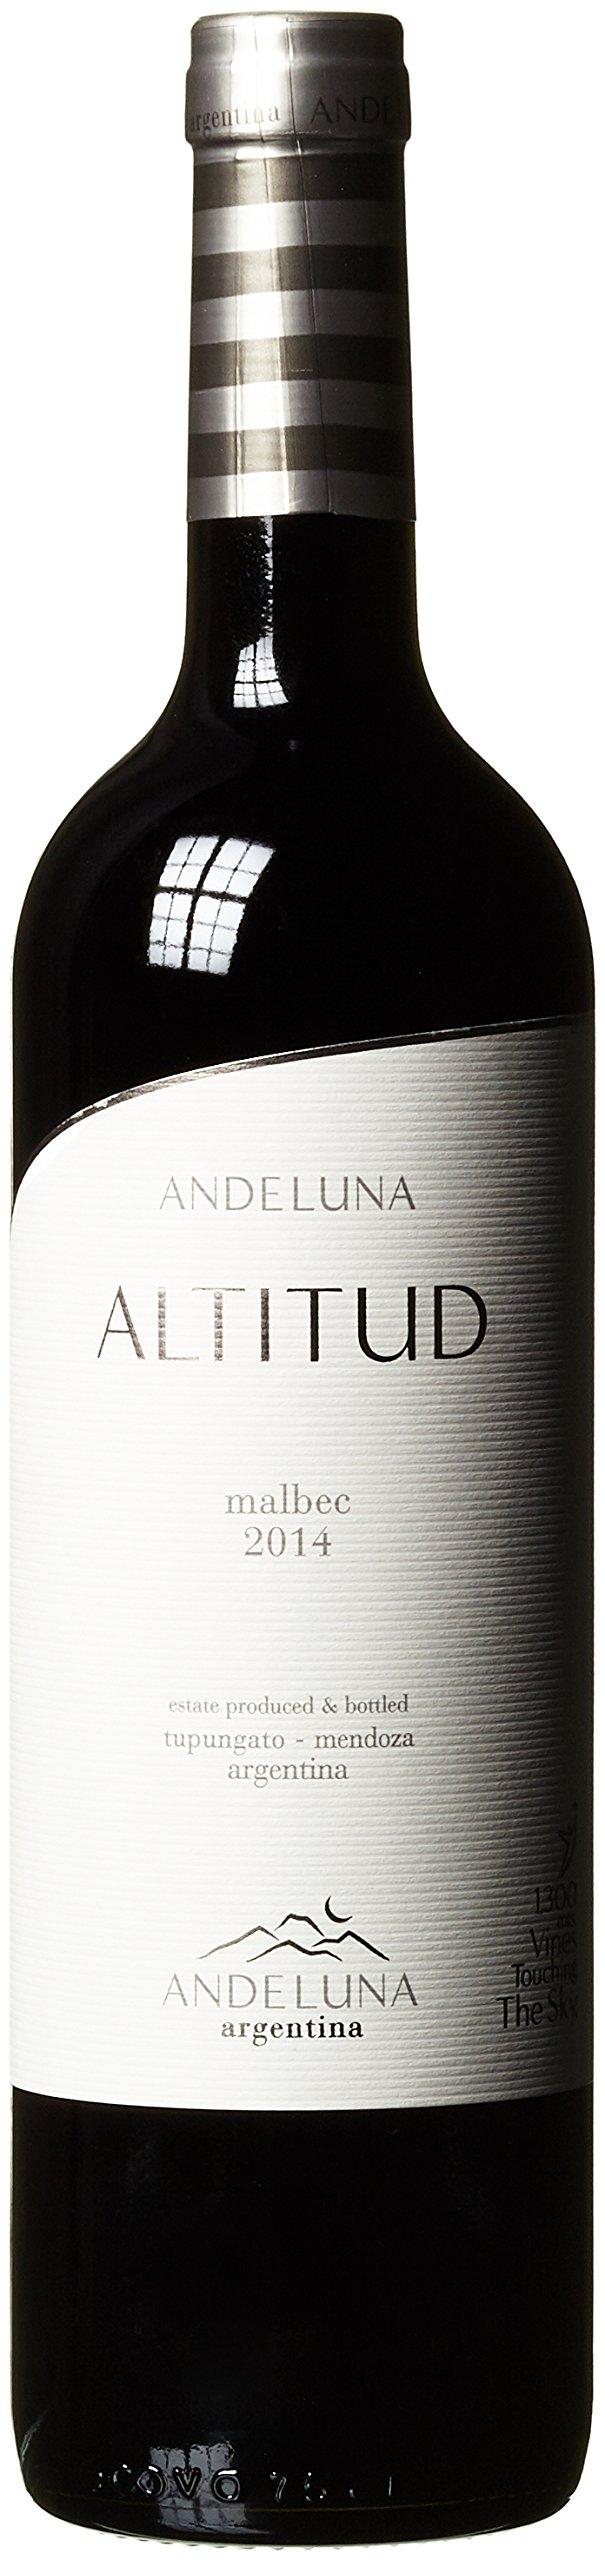 Andeluna-Reserve-Altitud-Malbec-2014-Trocken-3-x-075-l